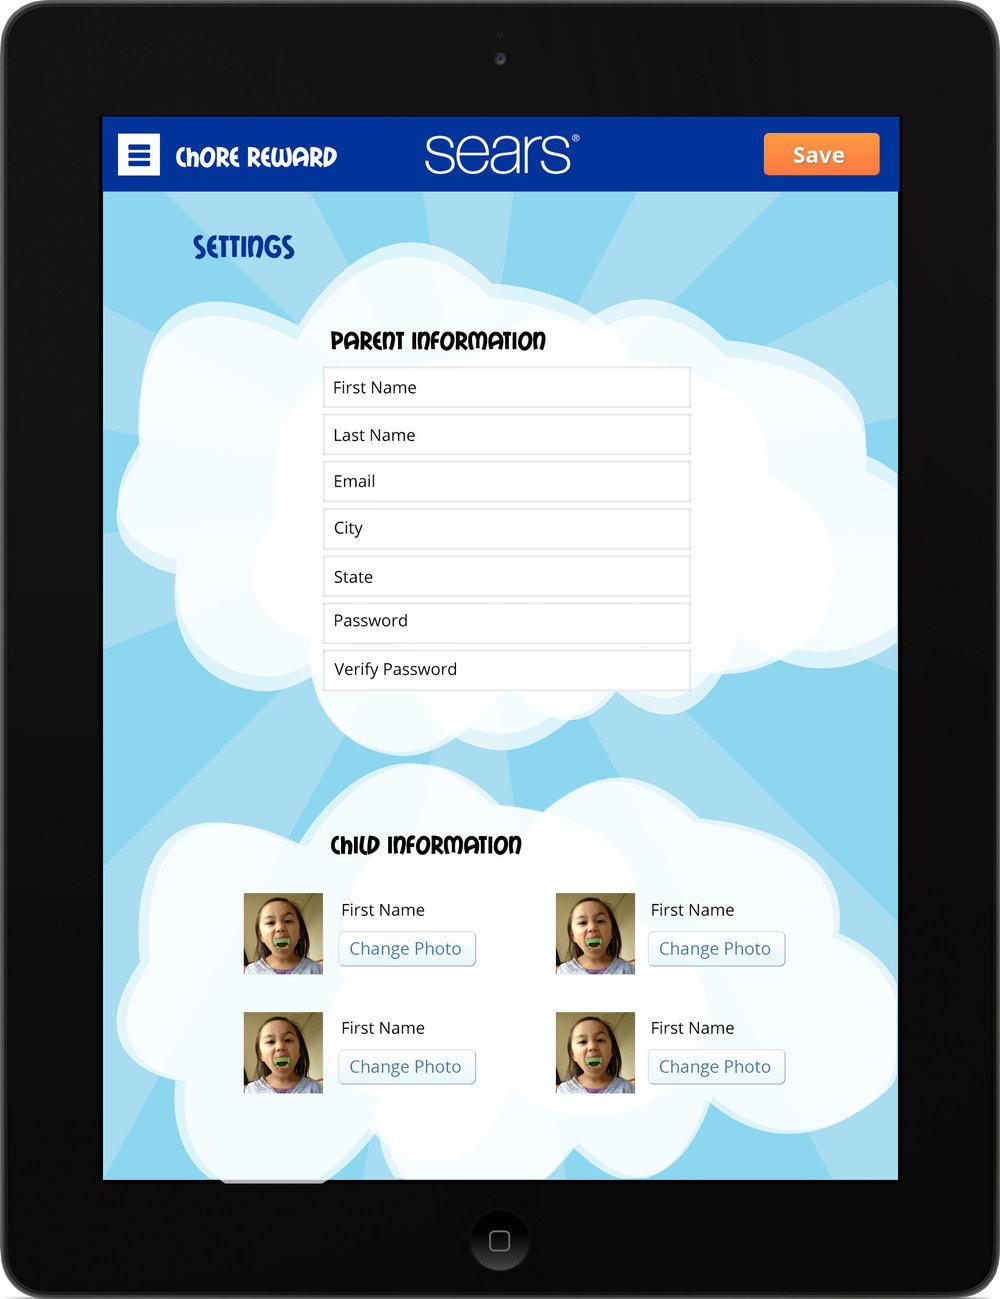 chore_reward_app_2.jpg